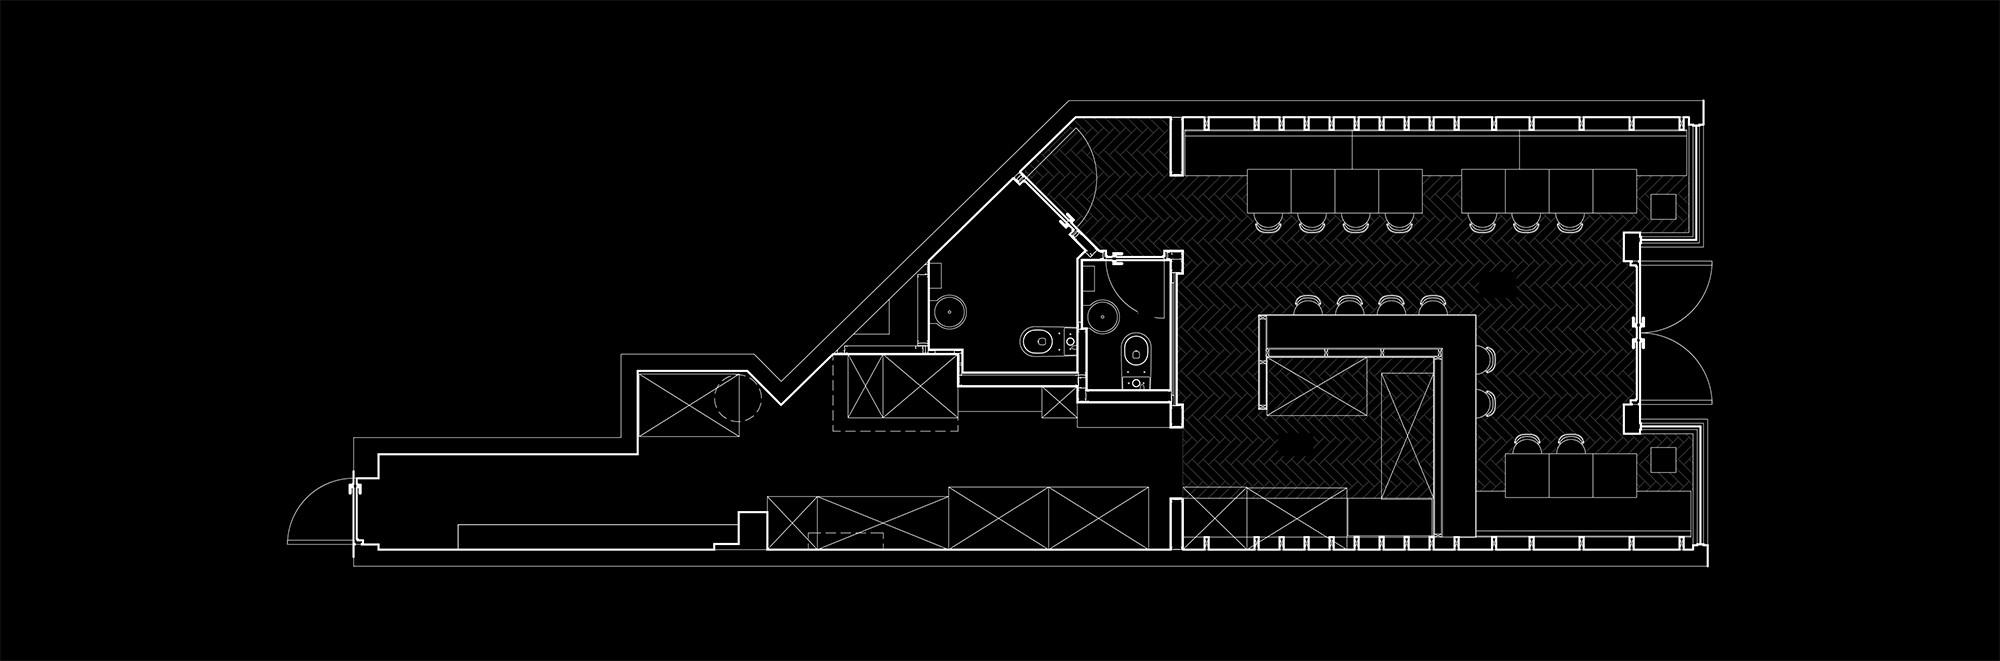 2014-07-wd-master-a-201-demo-main-plan